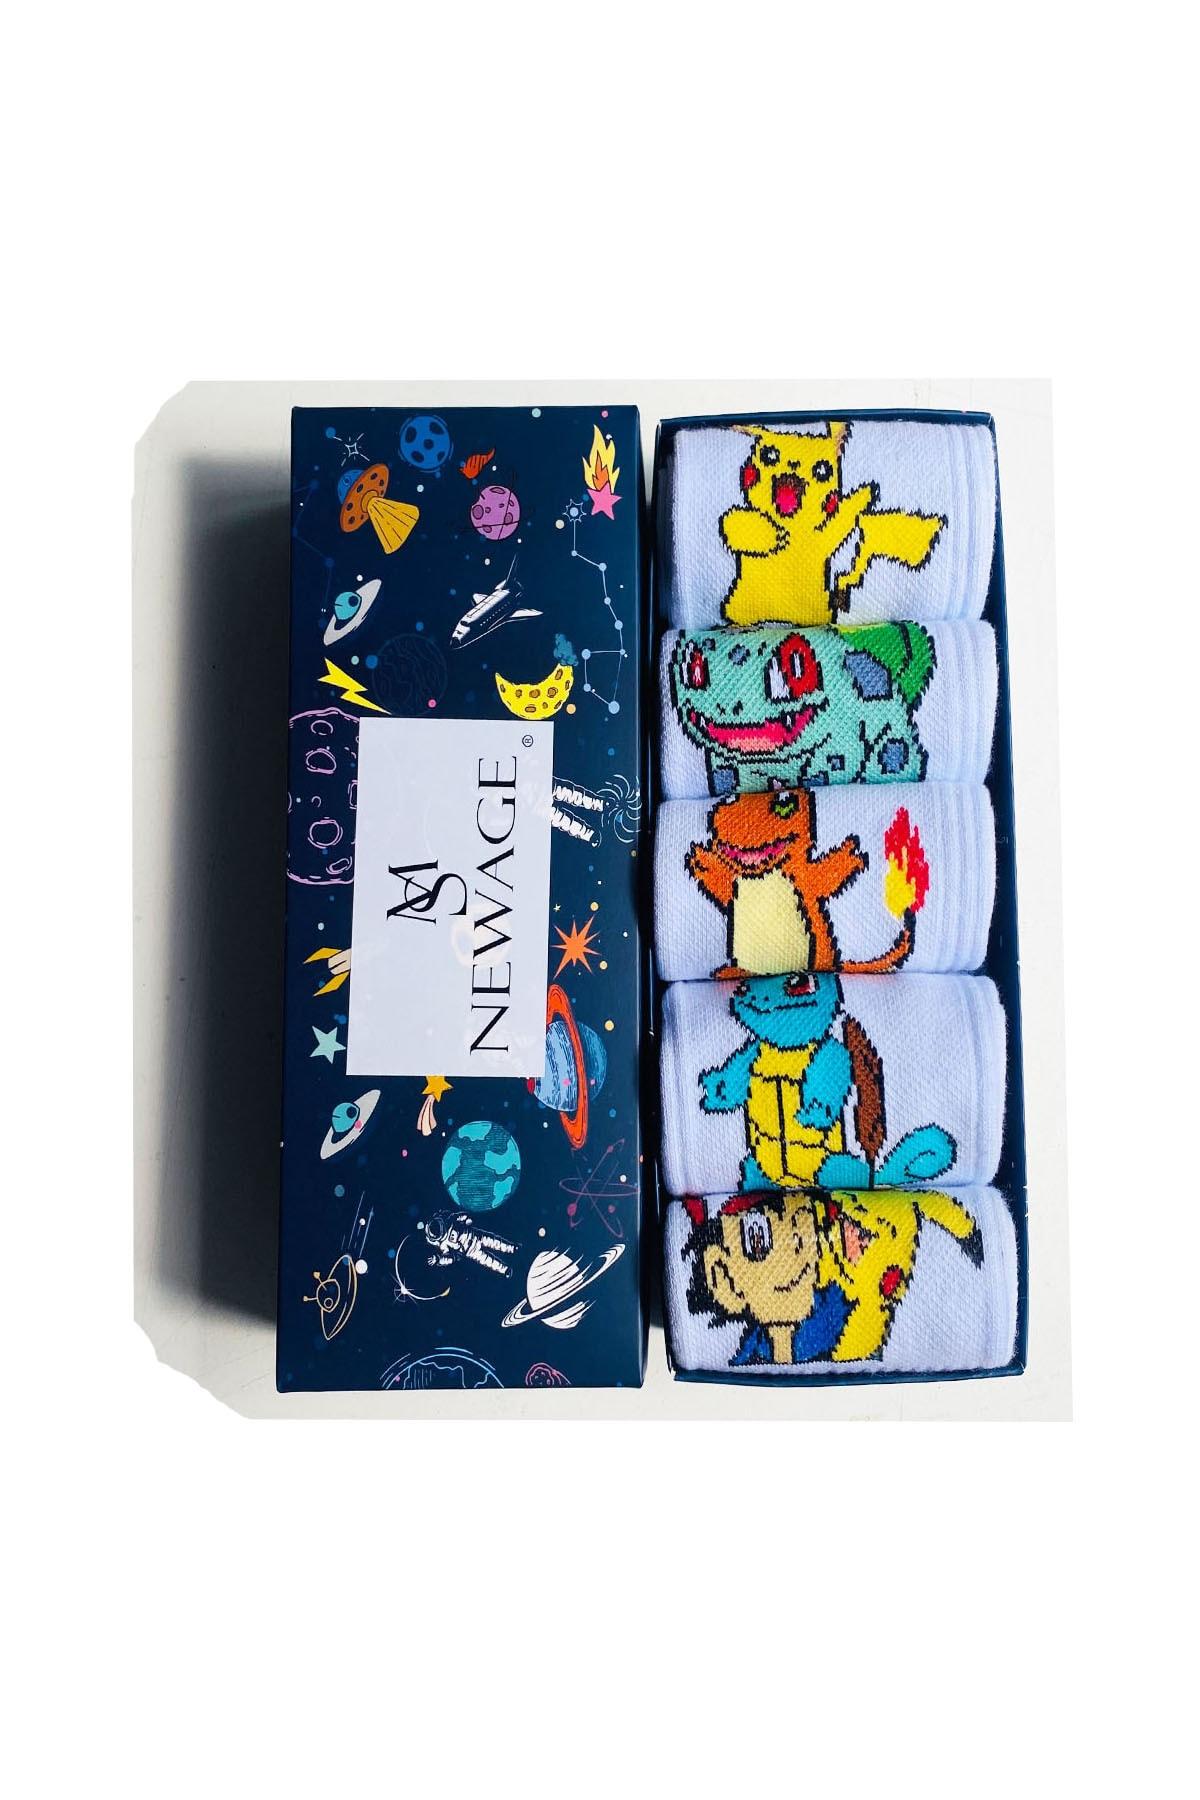 5'li Pokemon Karakterleri Desenli Renkli Çorap Seti